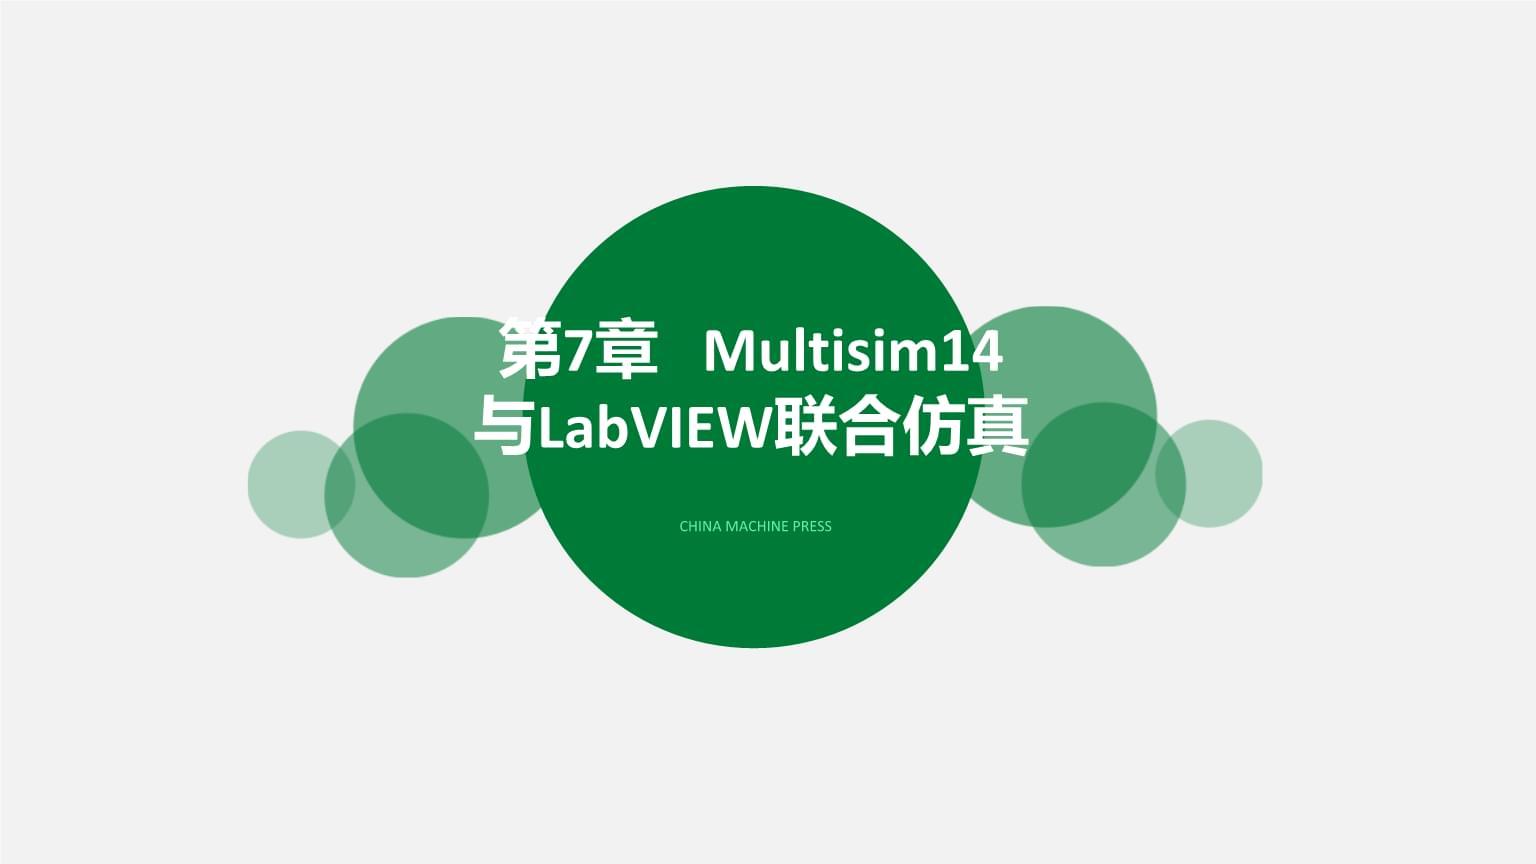 Multisim14电子系统仿真与设计第7章 Multisim14与LabVIEW联合仿真.ppt